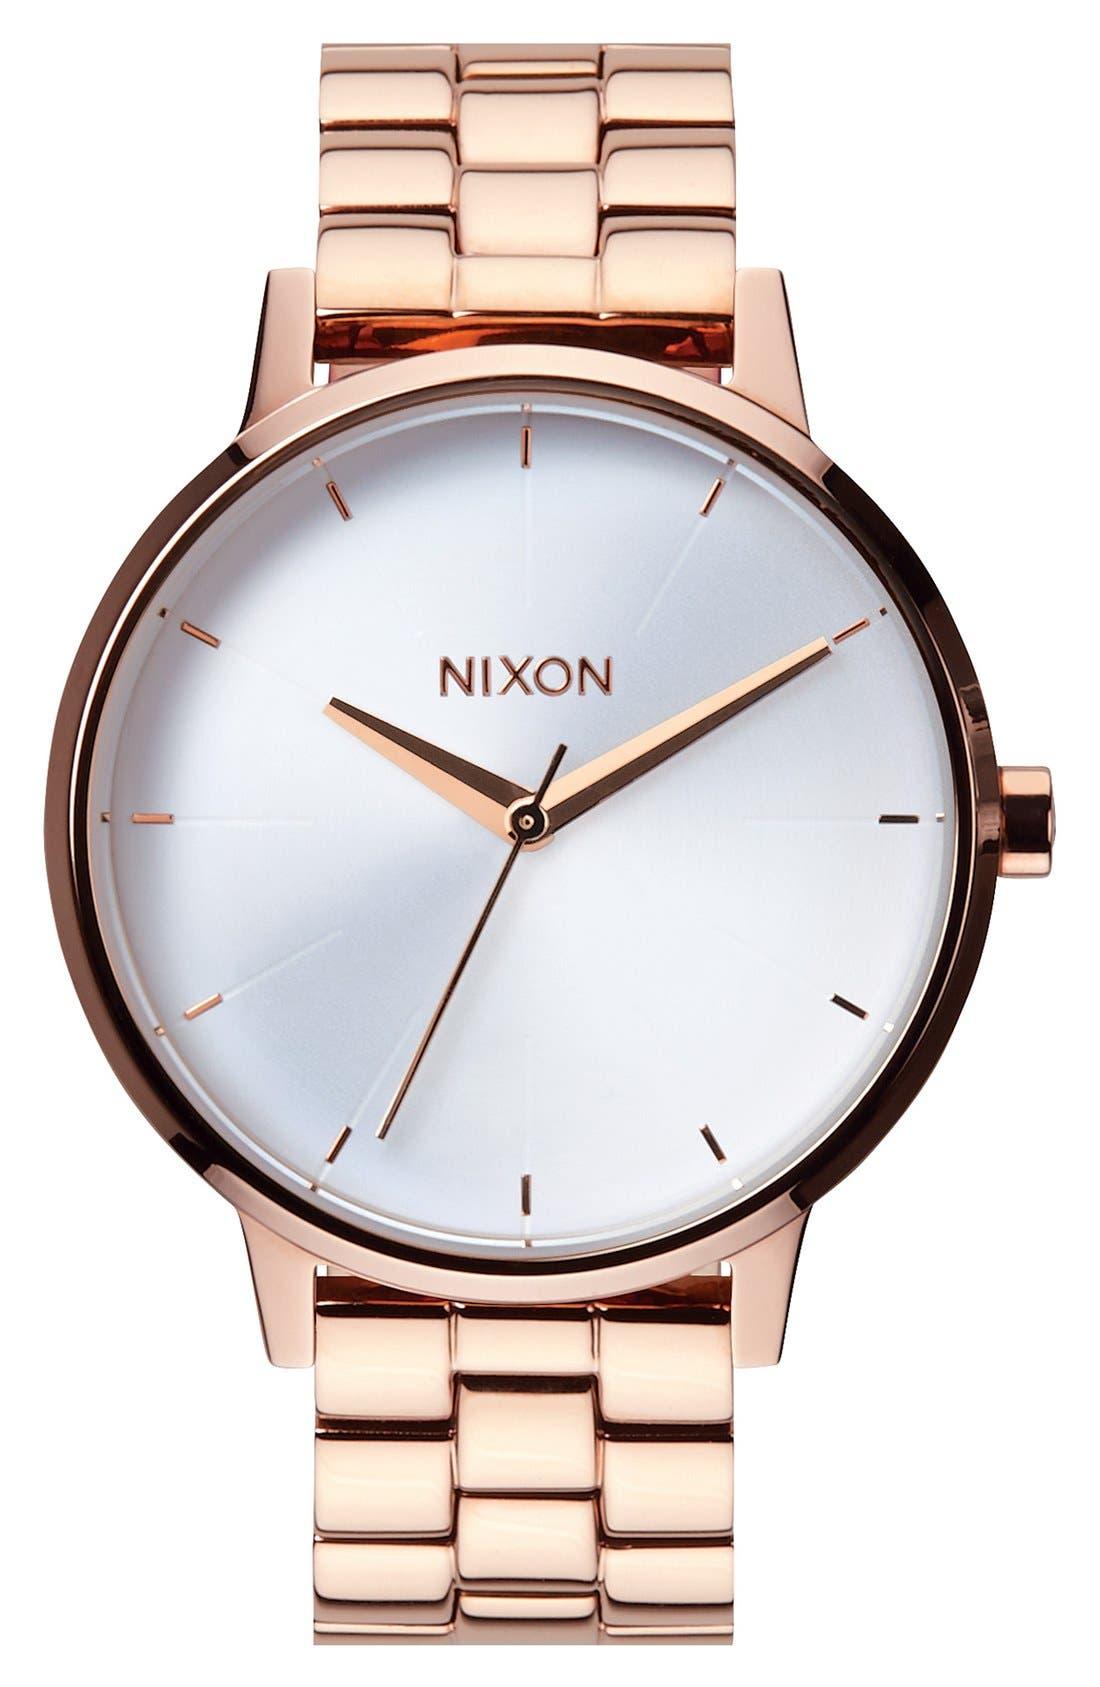 NIXON 'The Kensington' Bracelet Watch, 37Mm in Rose Gold/ White